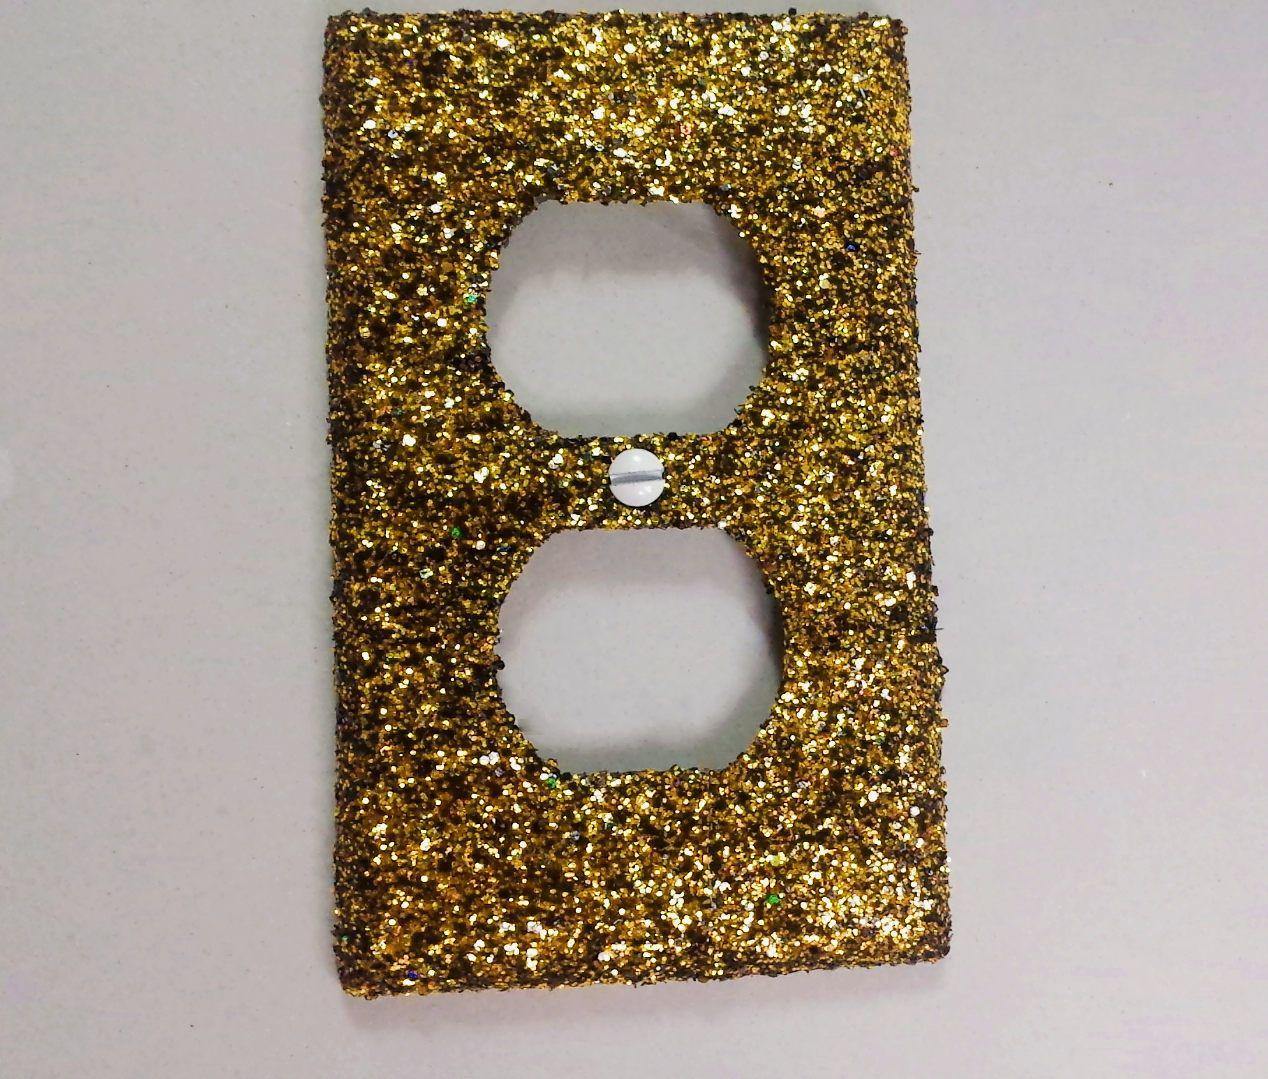 Decorative Light Switch Plates Black Yellow Gold Shiny Glitter Mix Decorative Bling Light